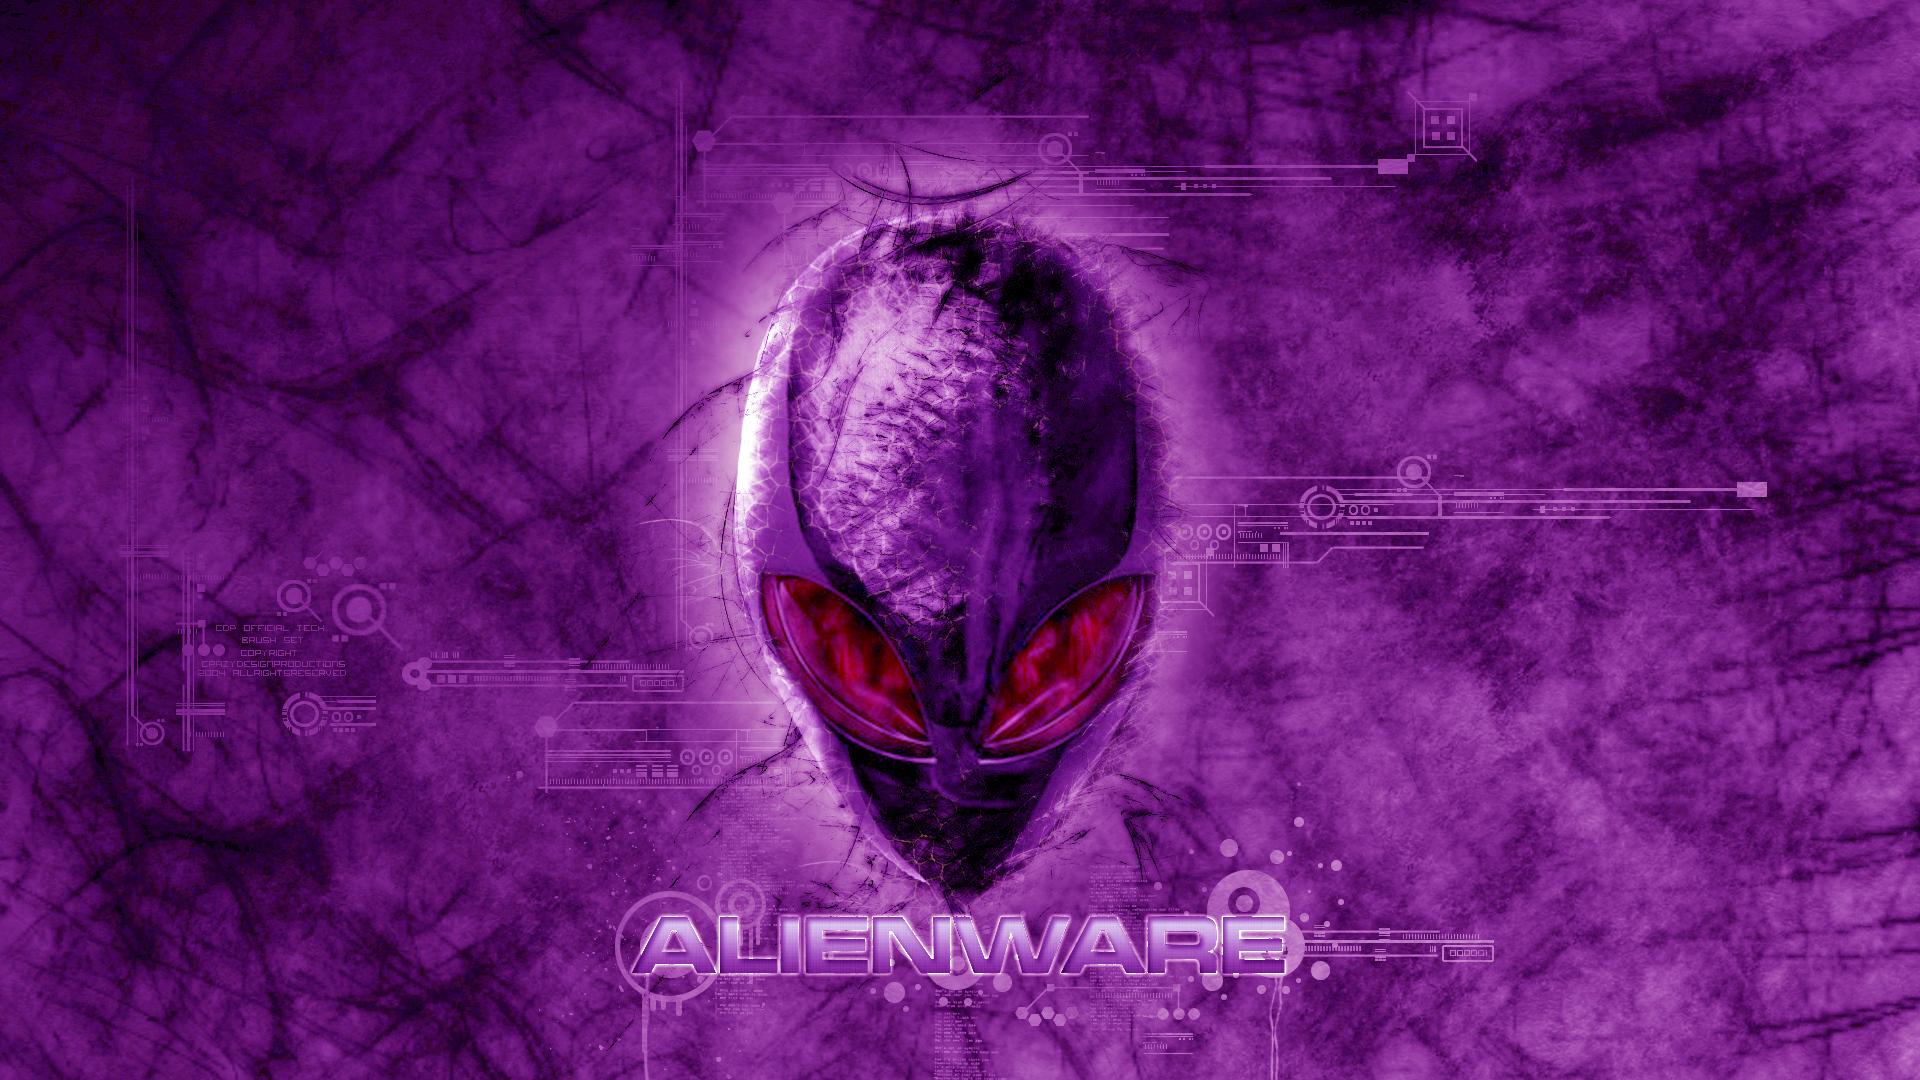 alienware dark violet red eyes logo hd 1920x1080 1080p wallpaper 1920x1080